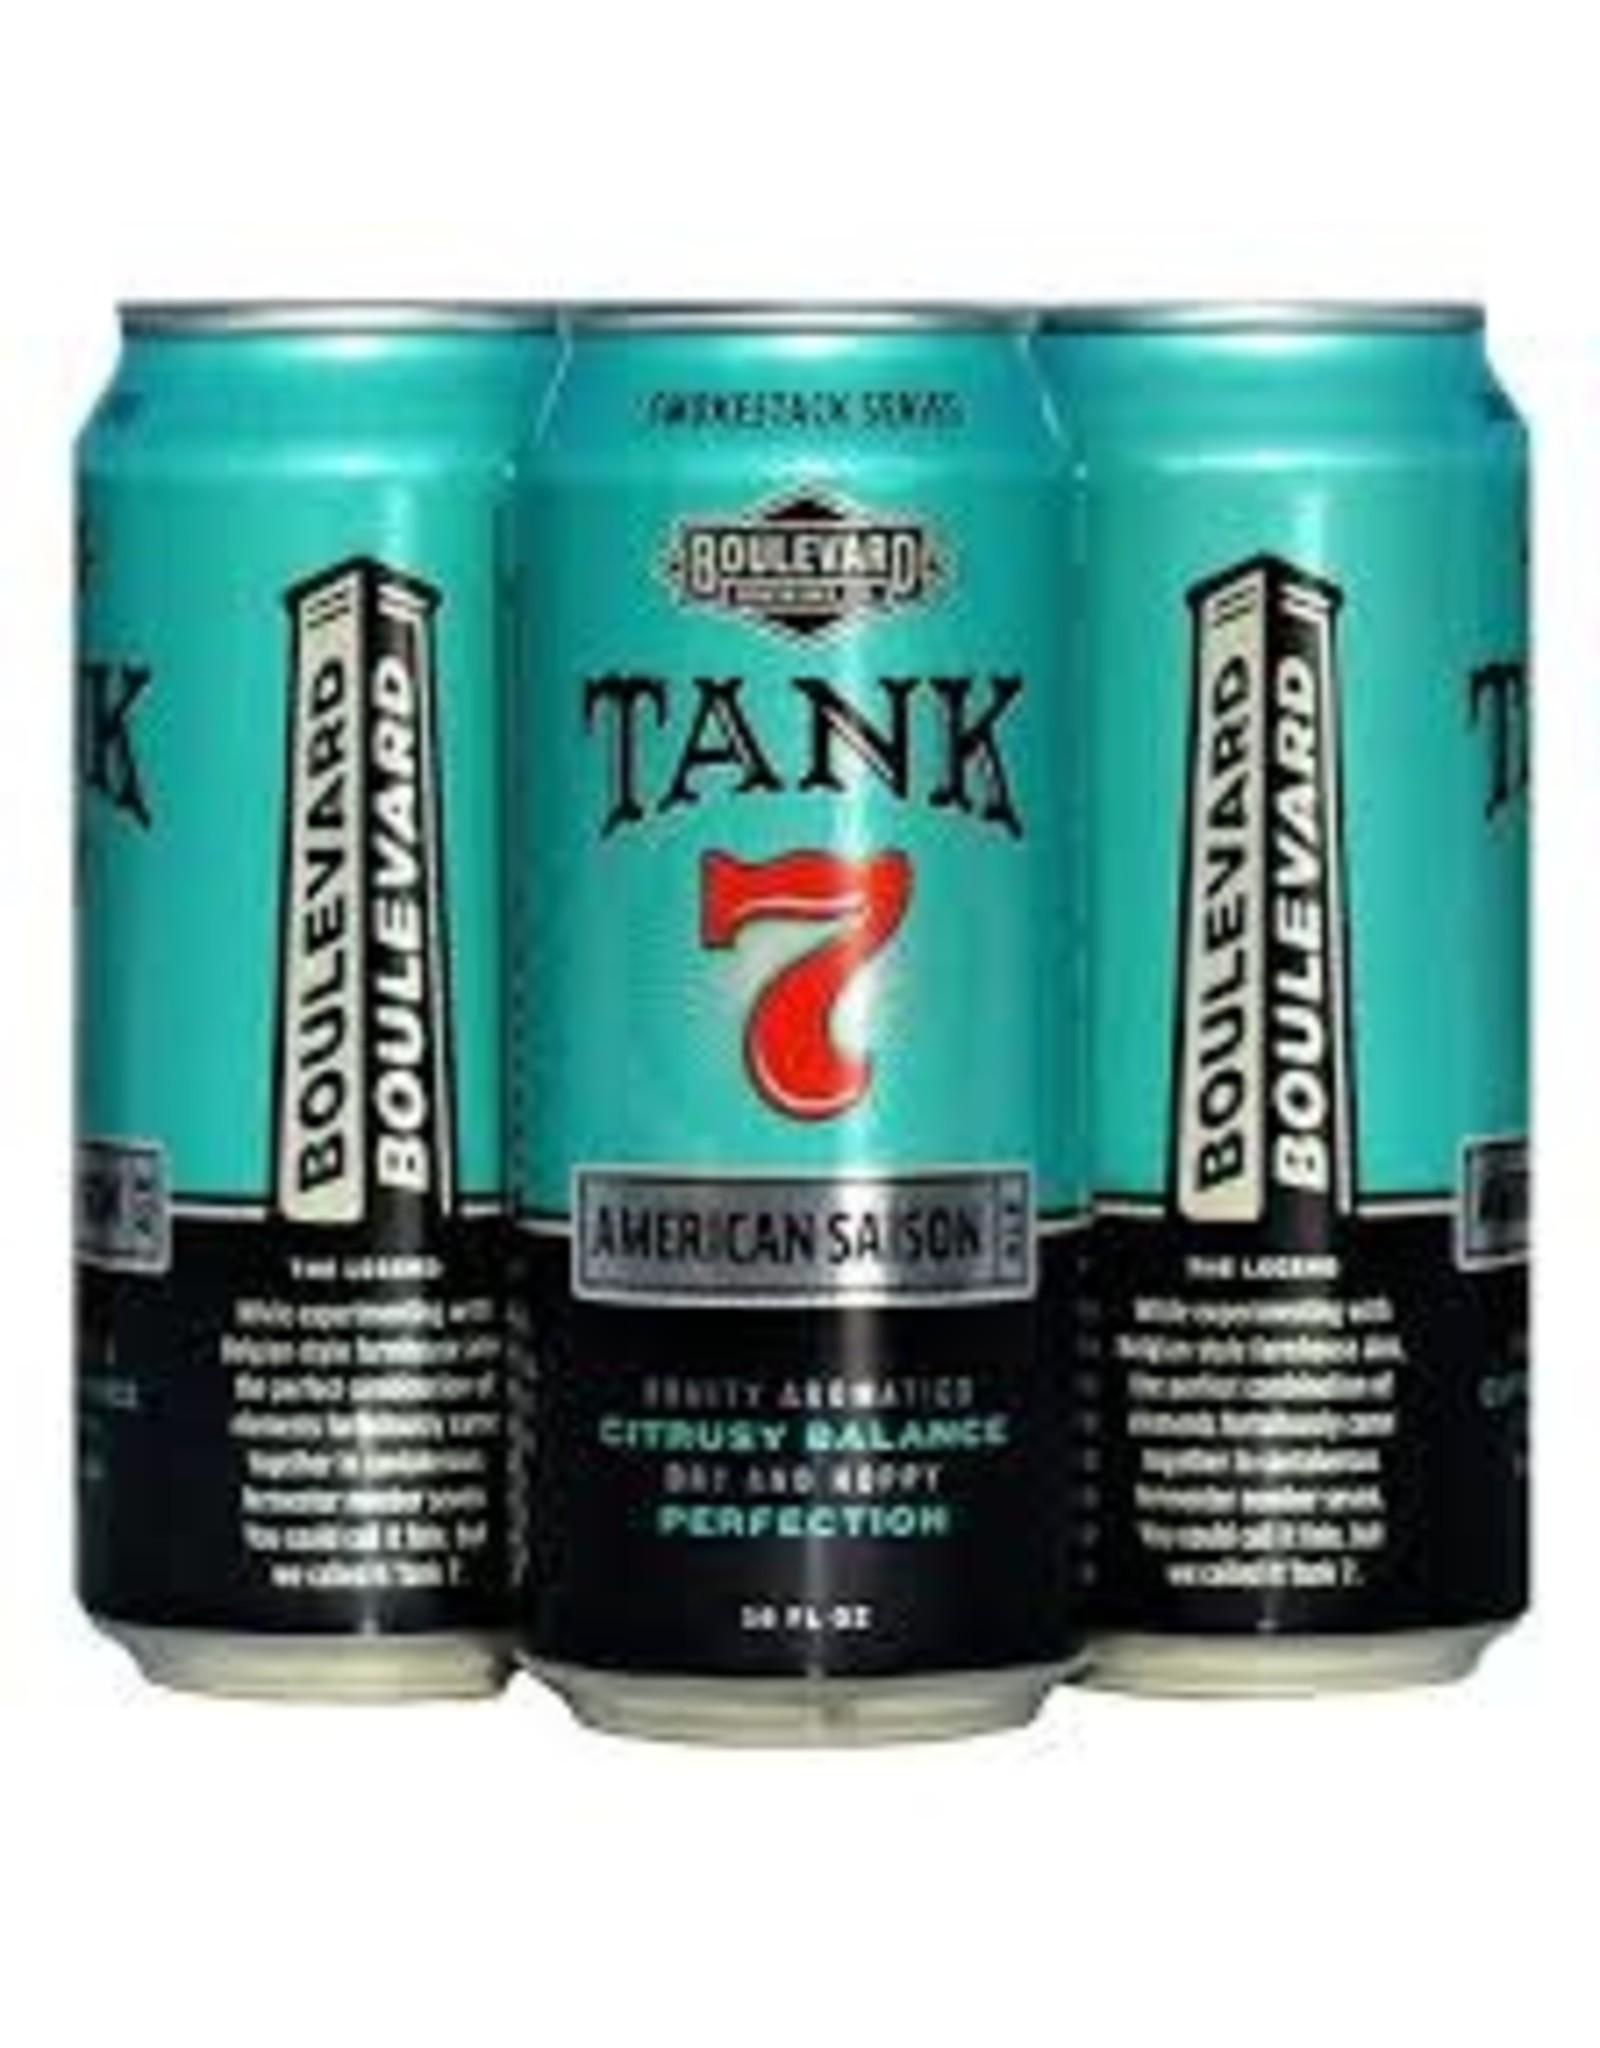 Boulevard Boulevard Tank 7 American Saison Ale